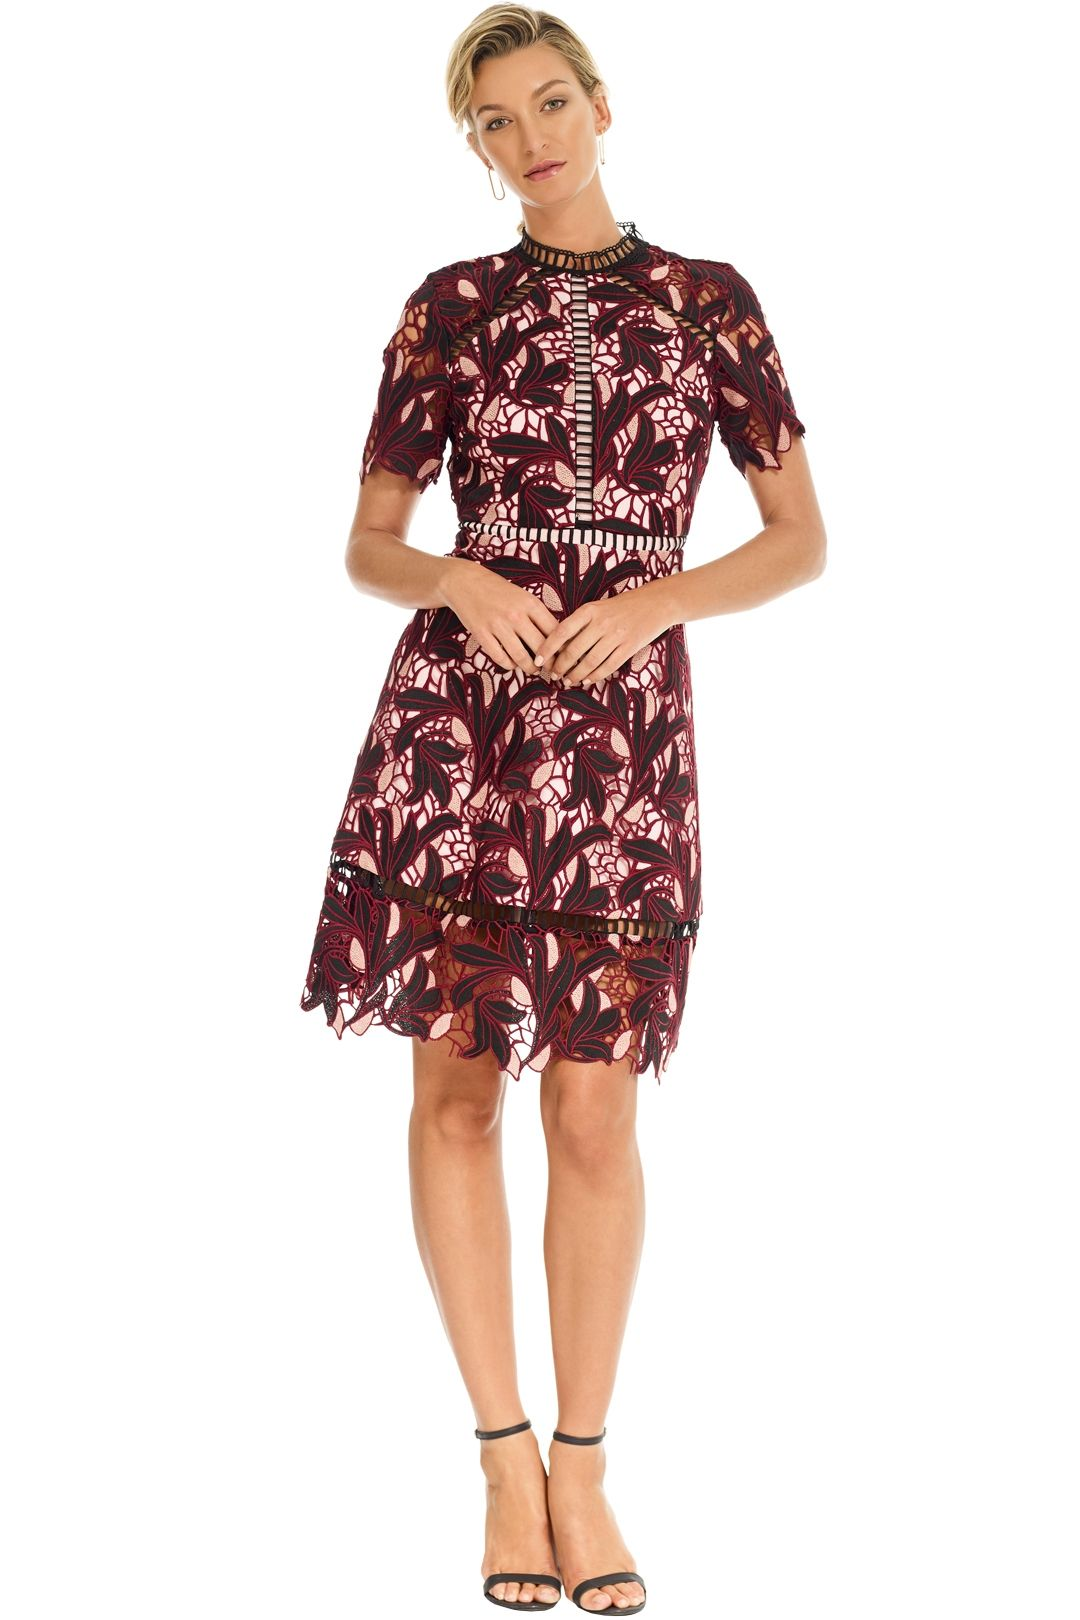 Elliatt - Montague Dress - Merlot - Front